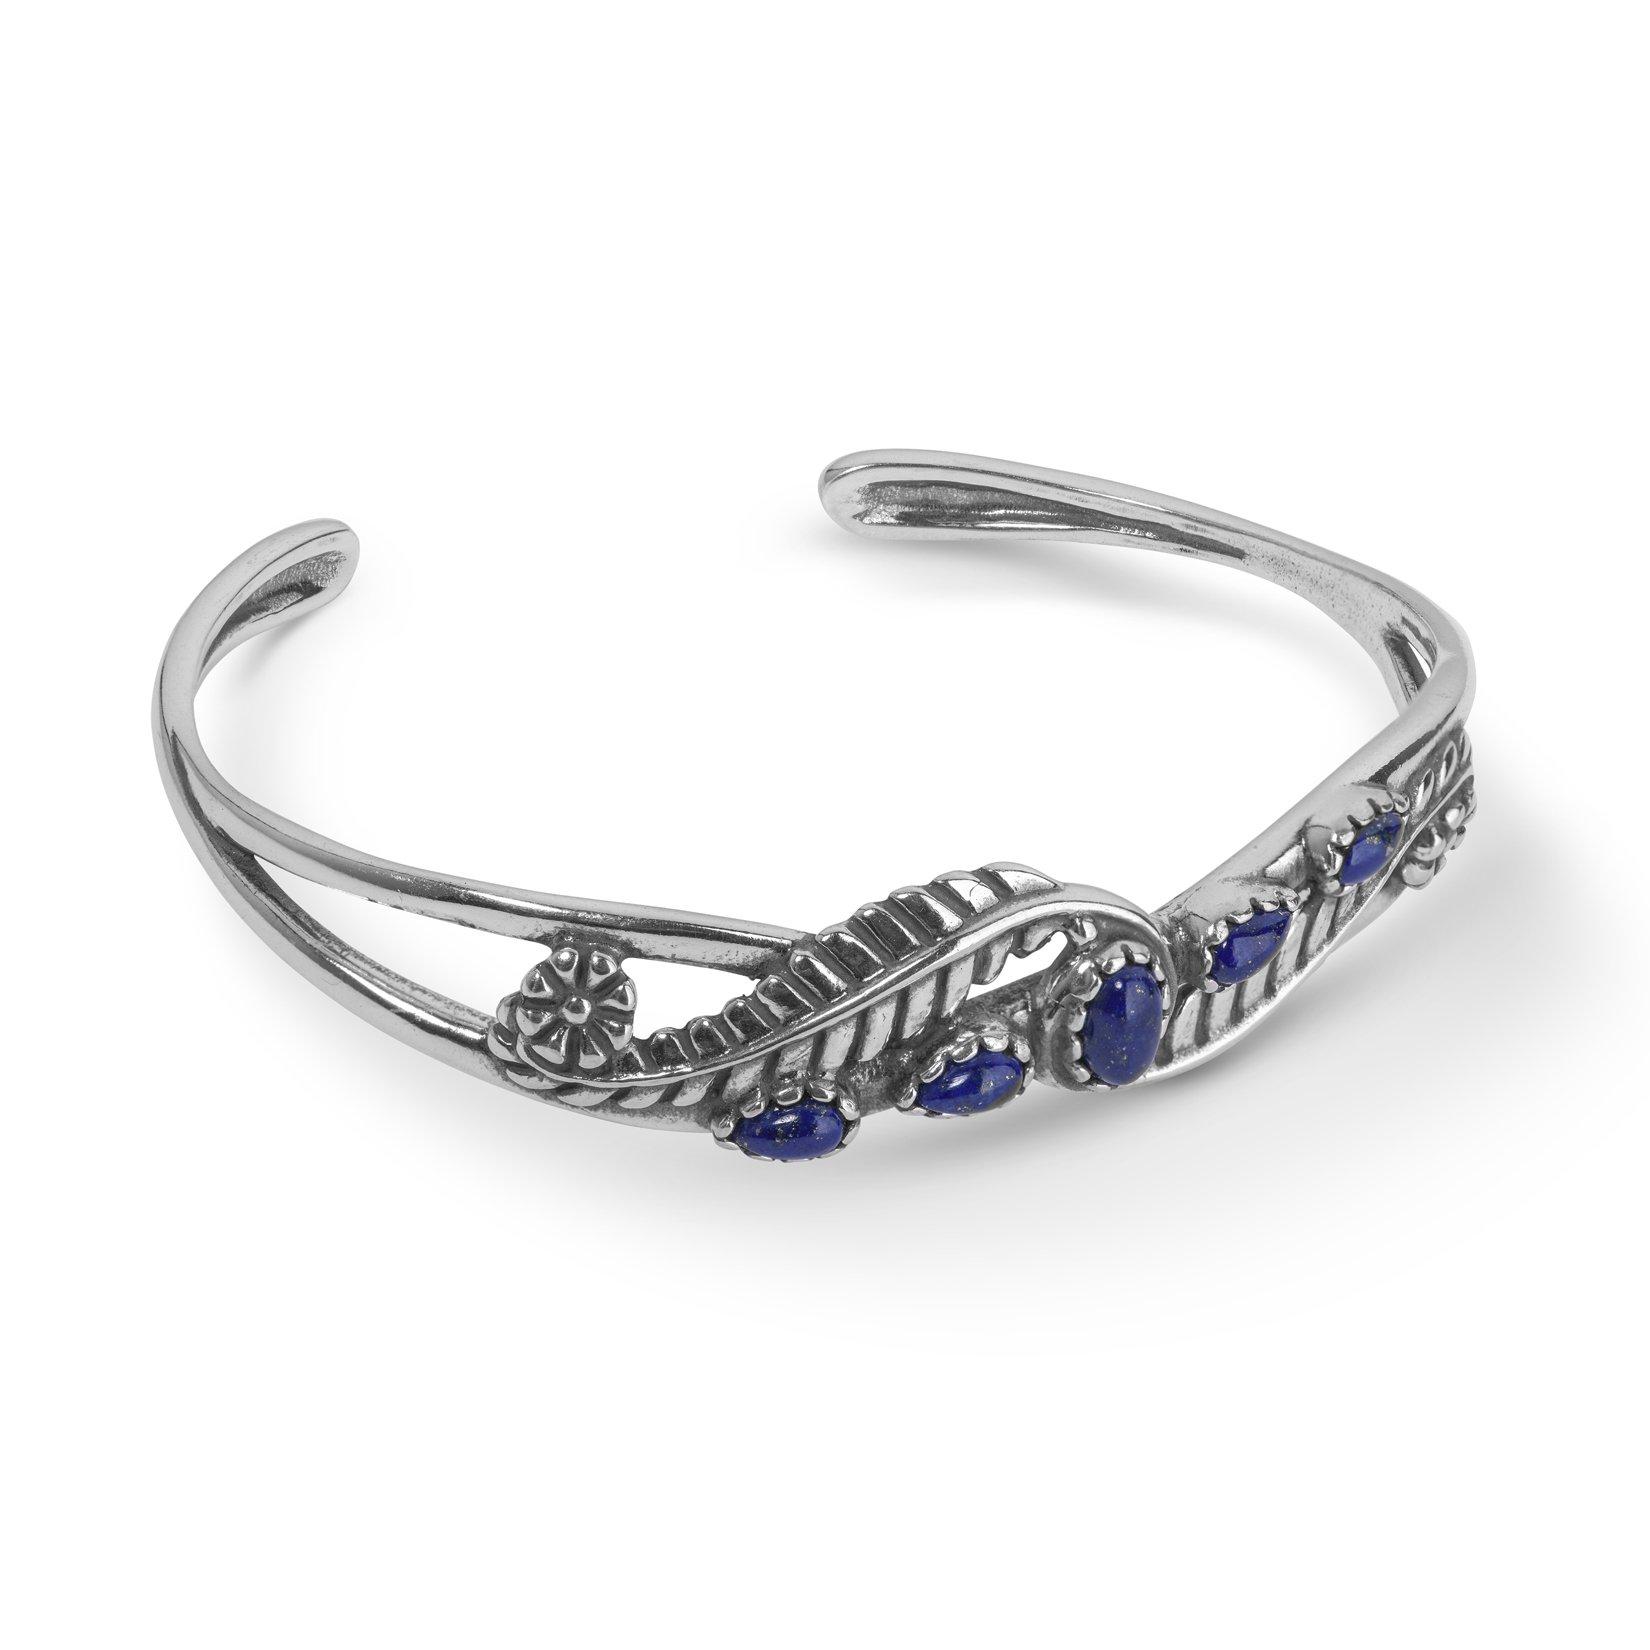 American West Sterling Silver & Lapis Five Stone Leaf Design Cuff Bracelet